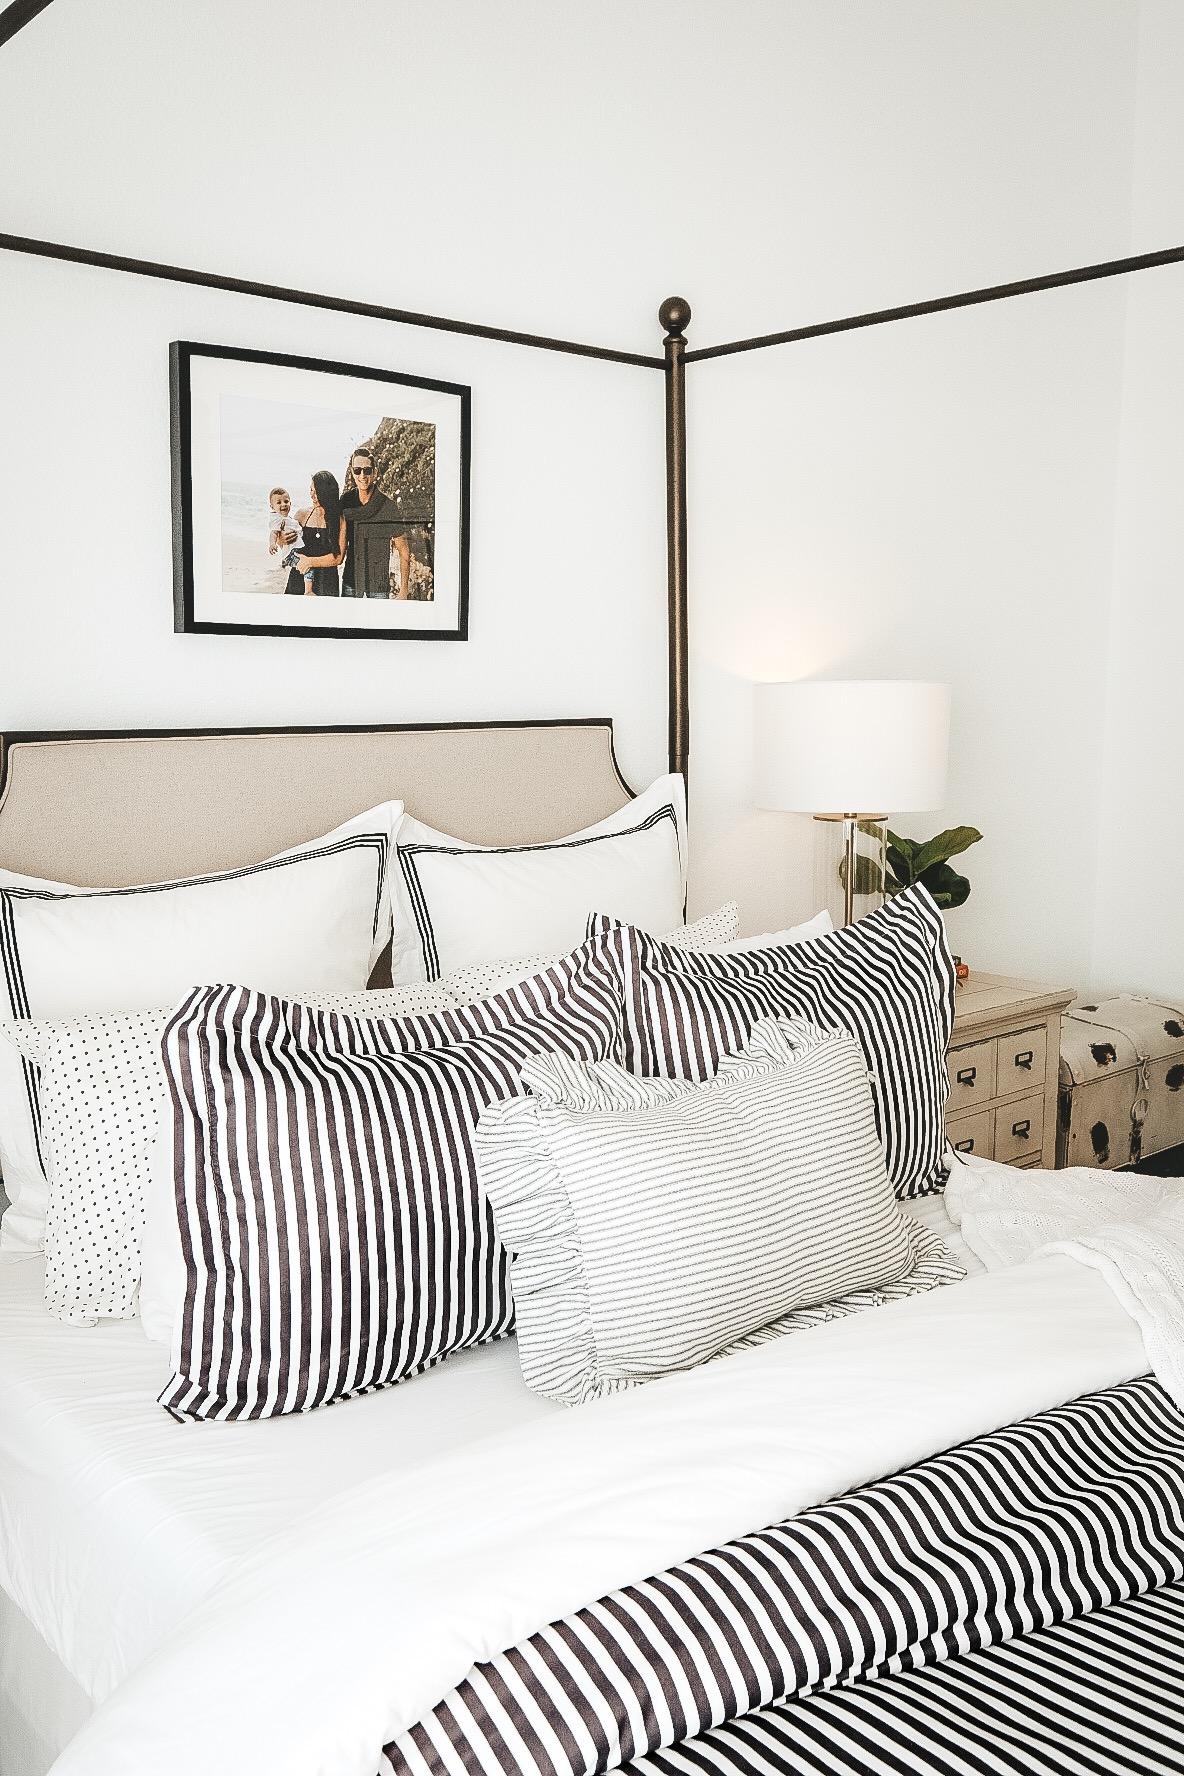 Modern Transitional Bedrrom Decor.  Black and White Master Bedroom.  Canopy Bed in Antique Brass. Light wash LVP flooring.